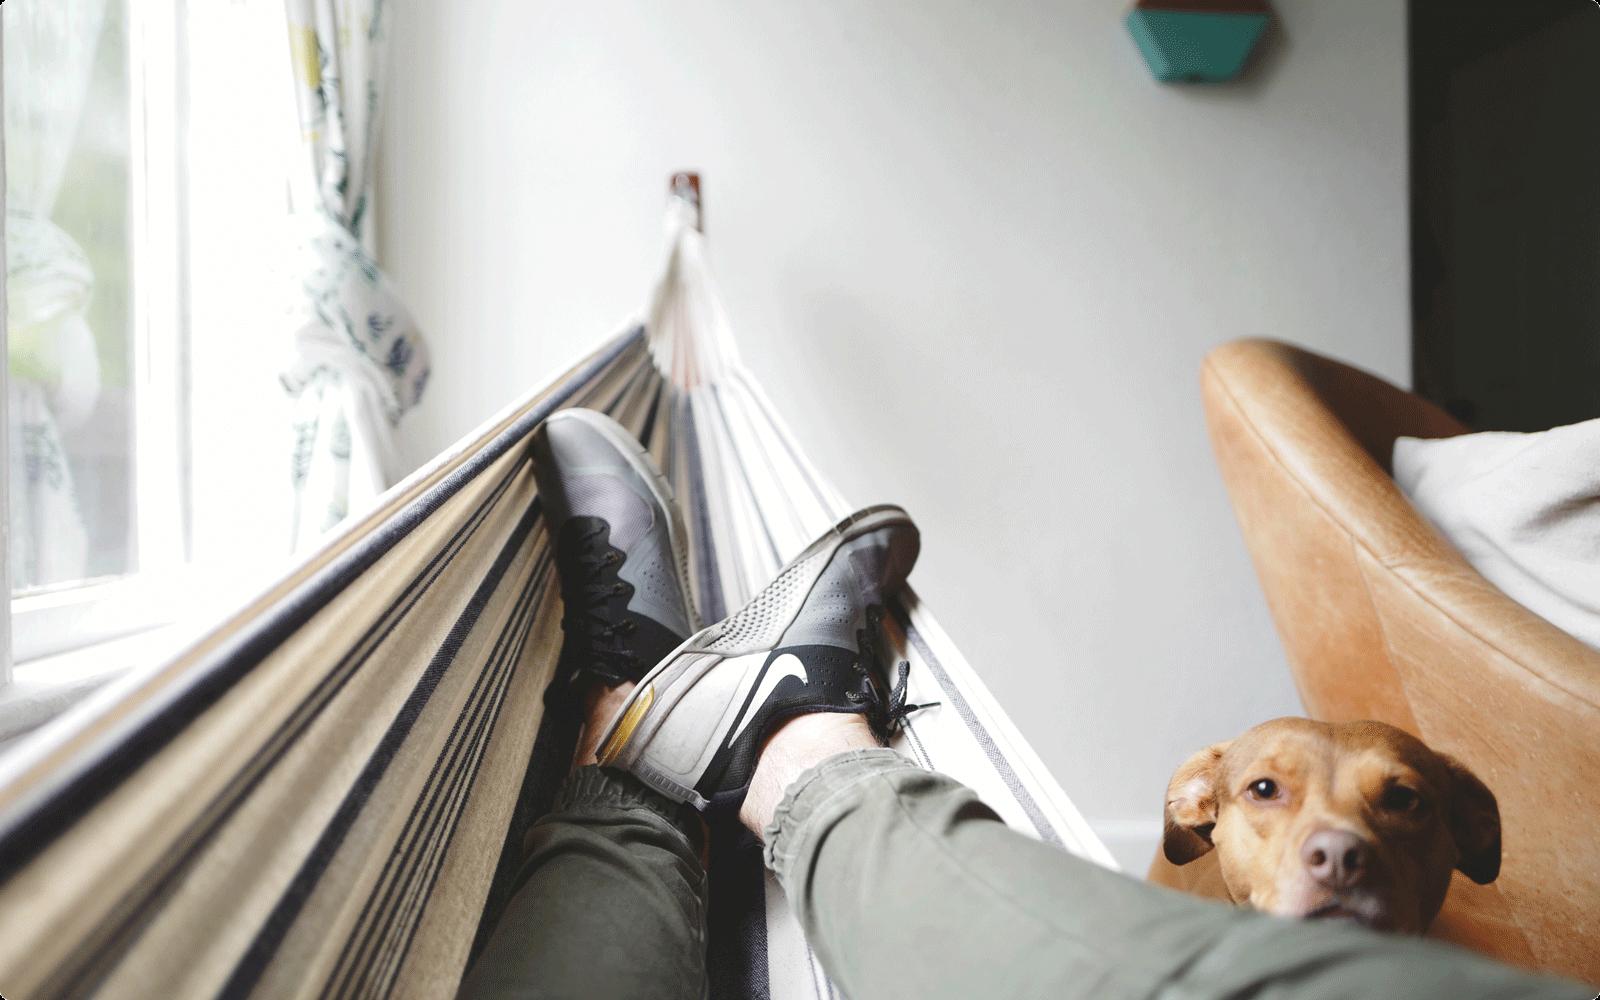 Work life balance as a hotelier